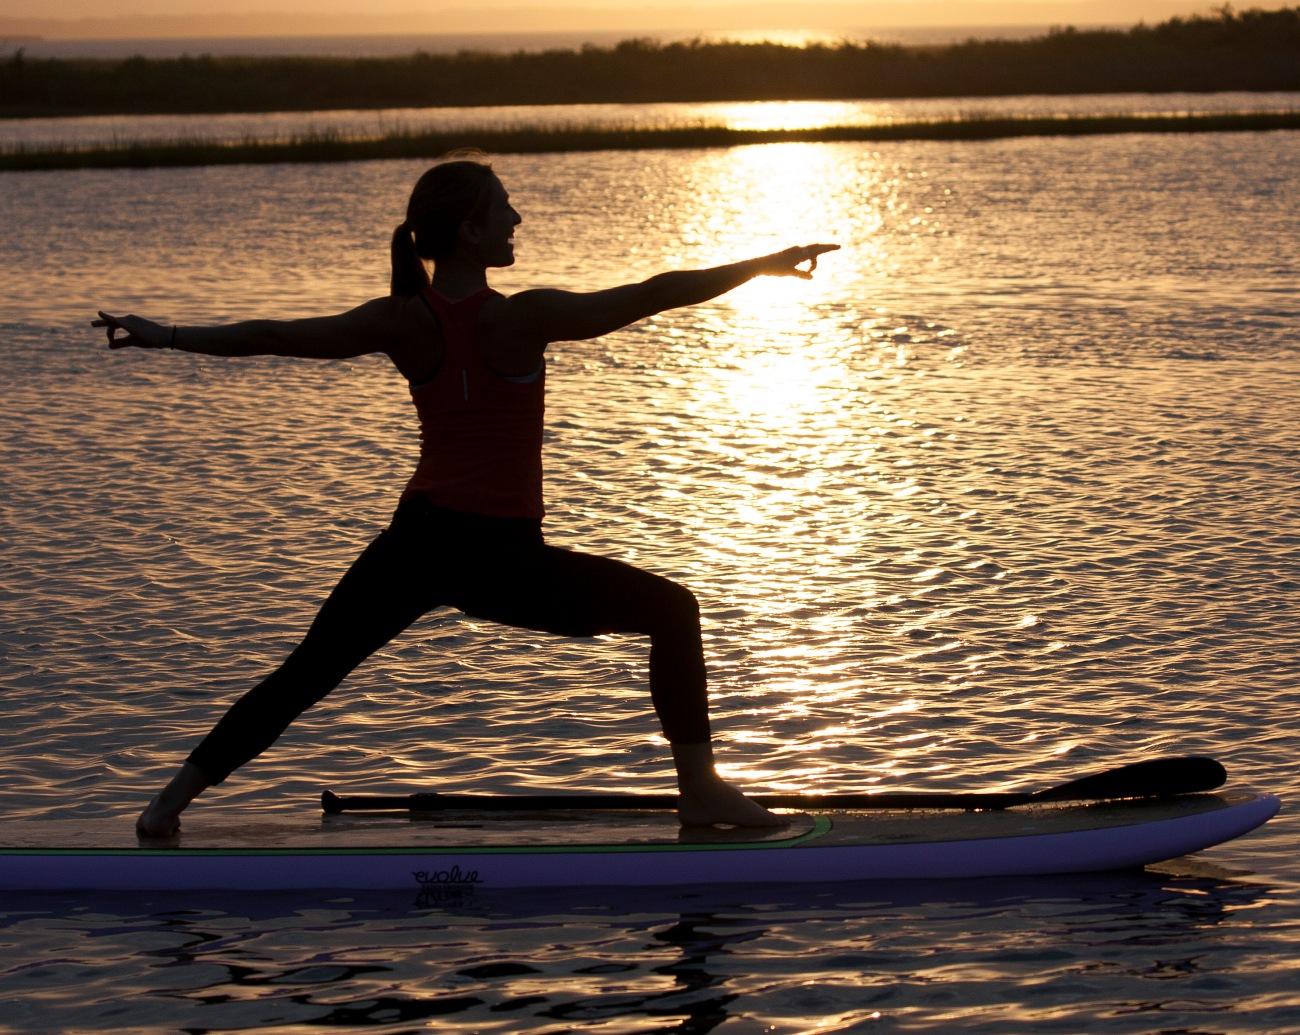 20161001_185651_Yoga Board